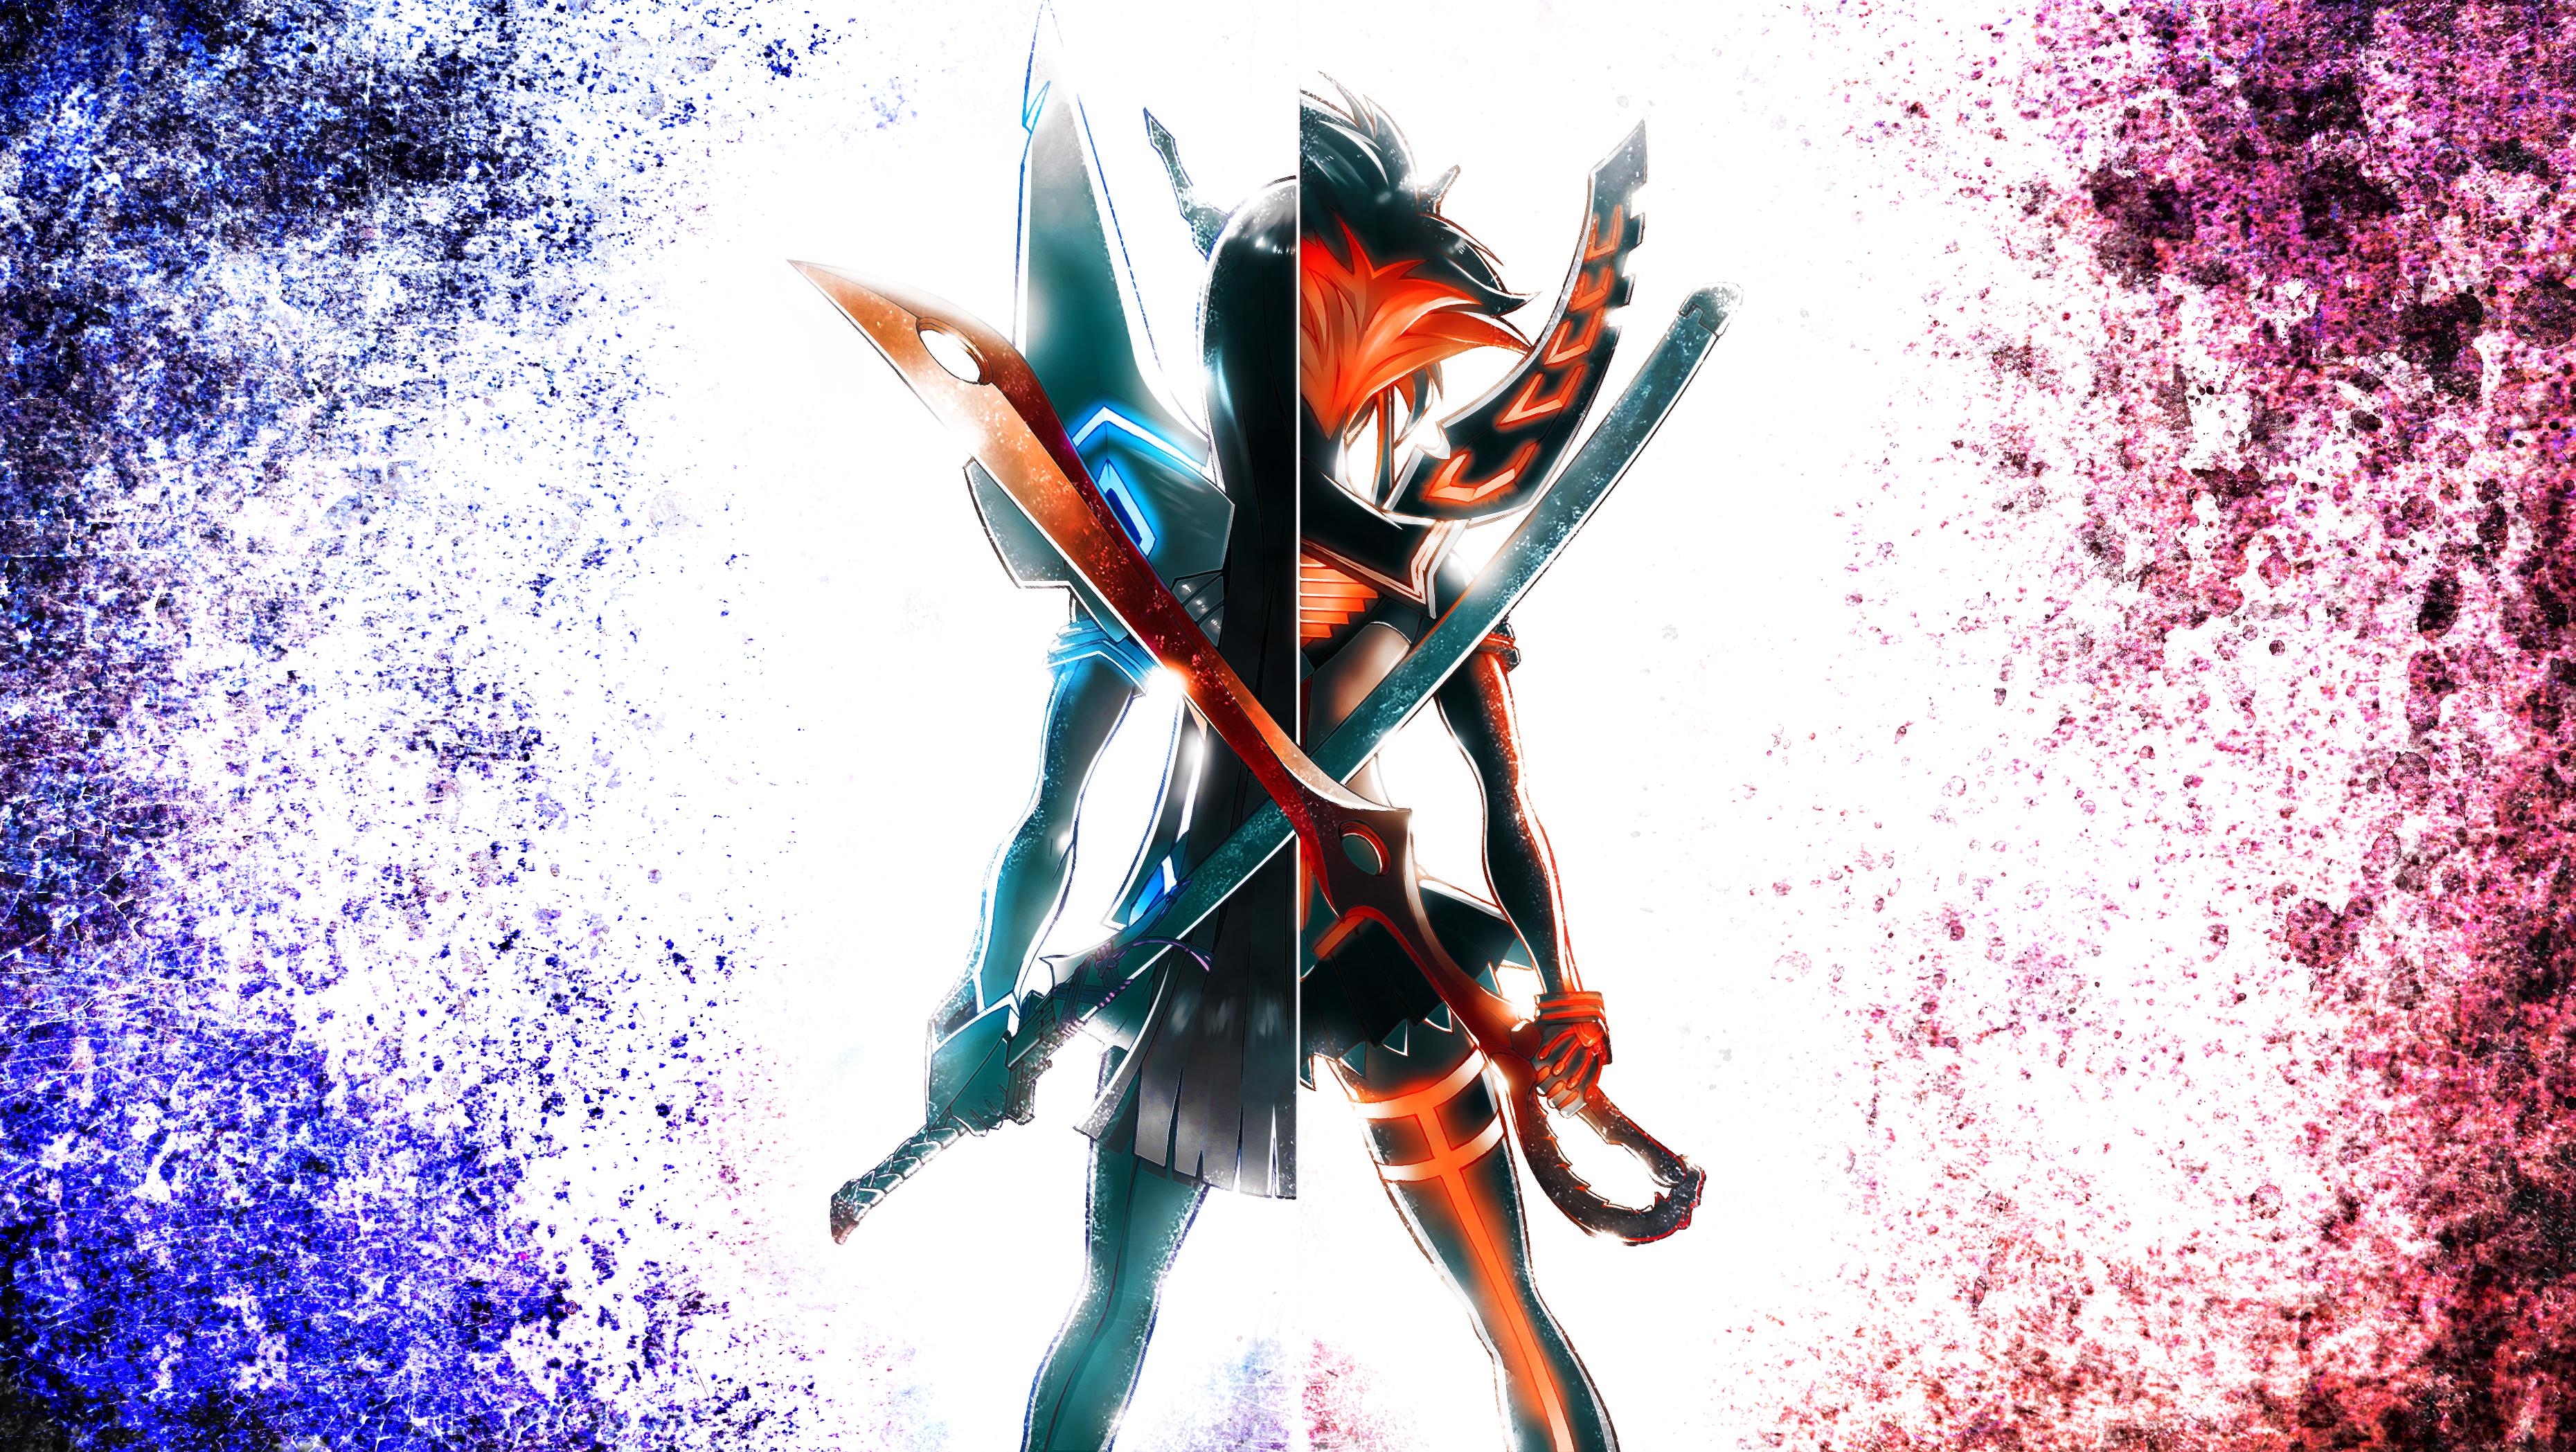 Kill La Kill Satsuki x Ryuuko UHD 4K by MajinTatsujin 3720x2097